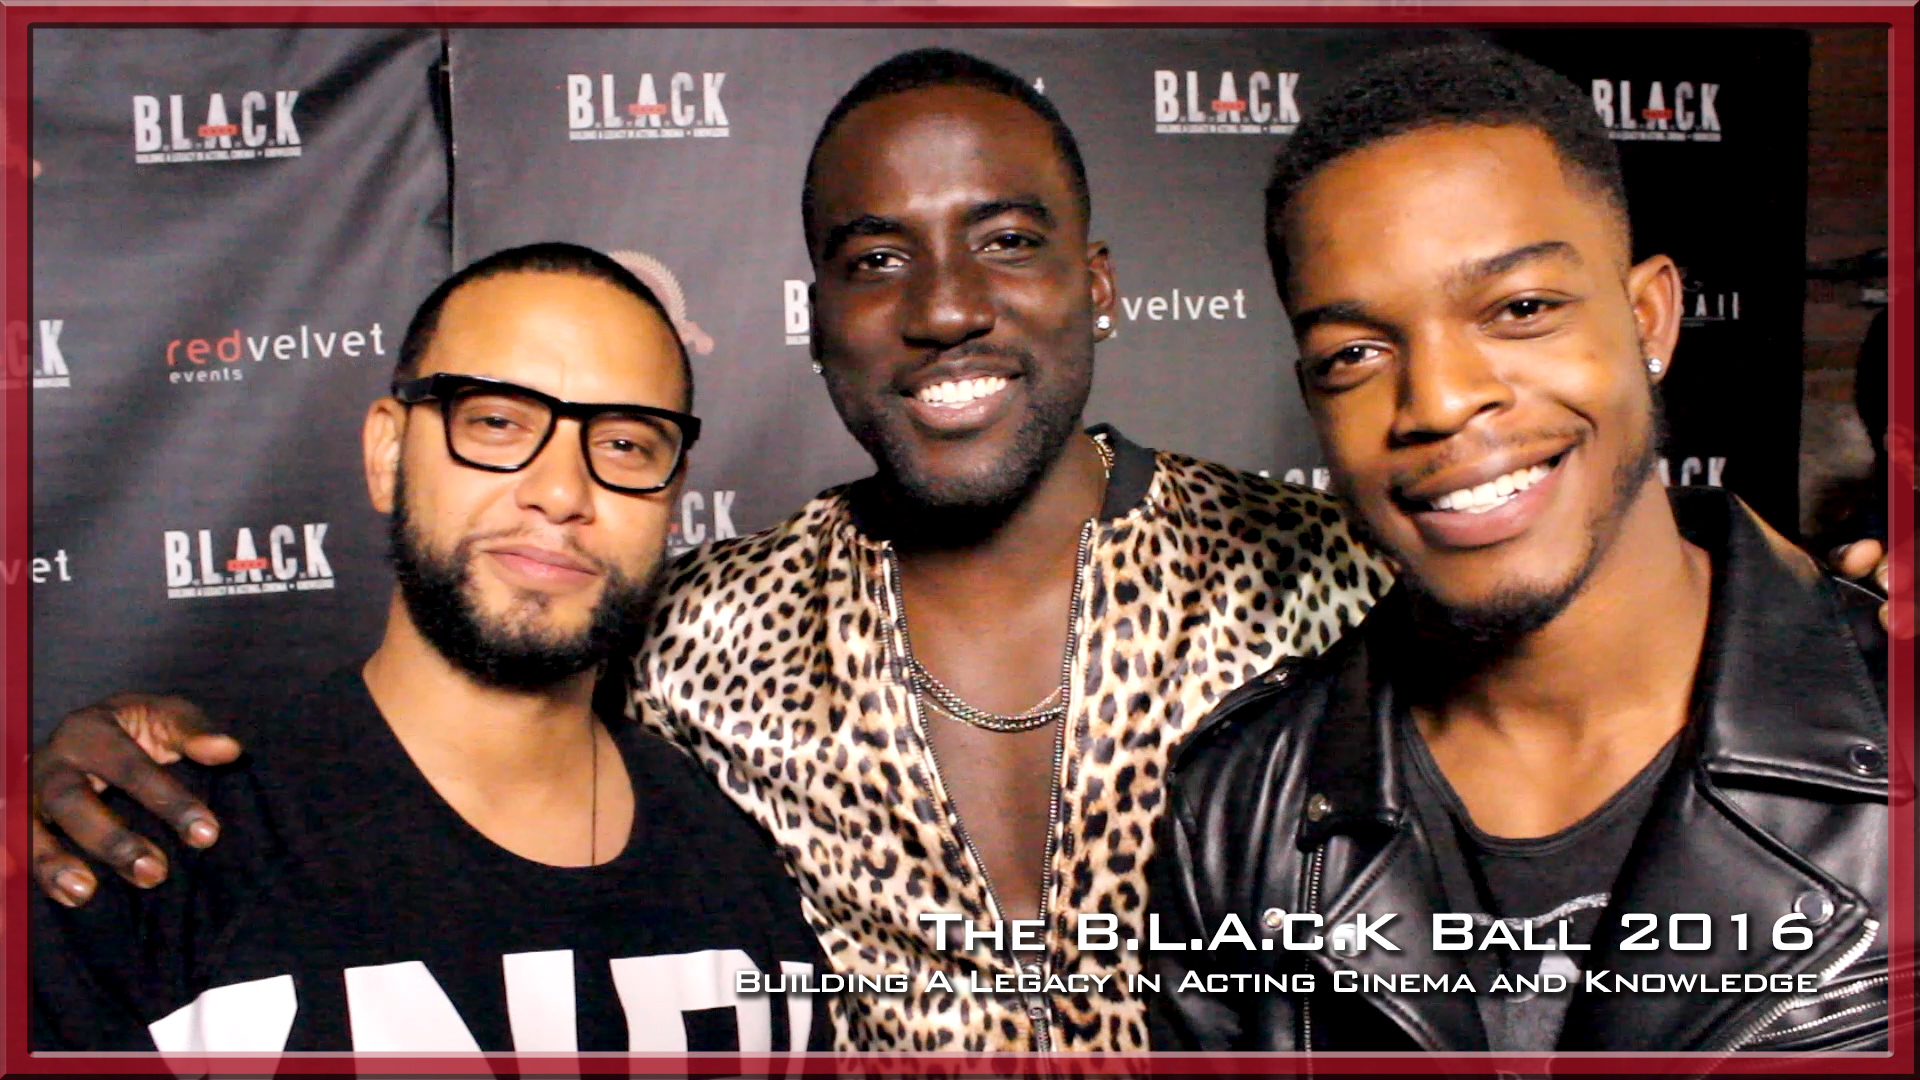 The B.L.A.C.K Ball 2016